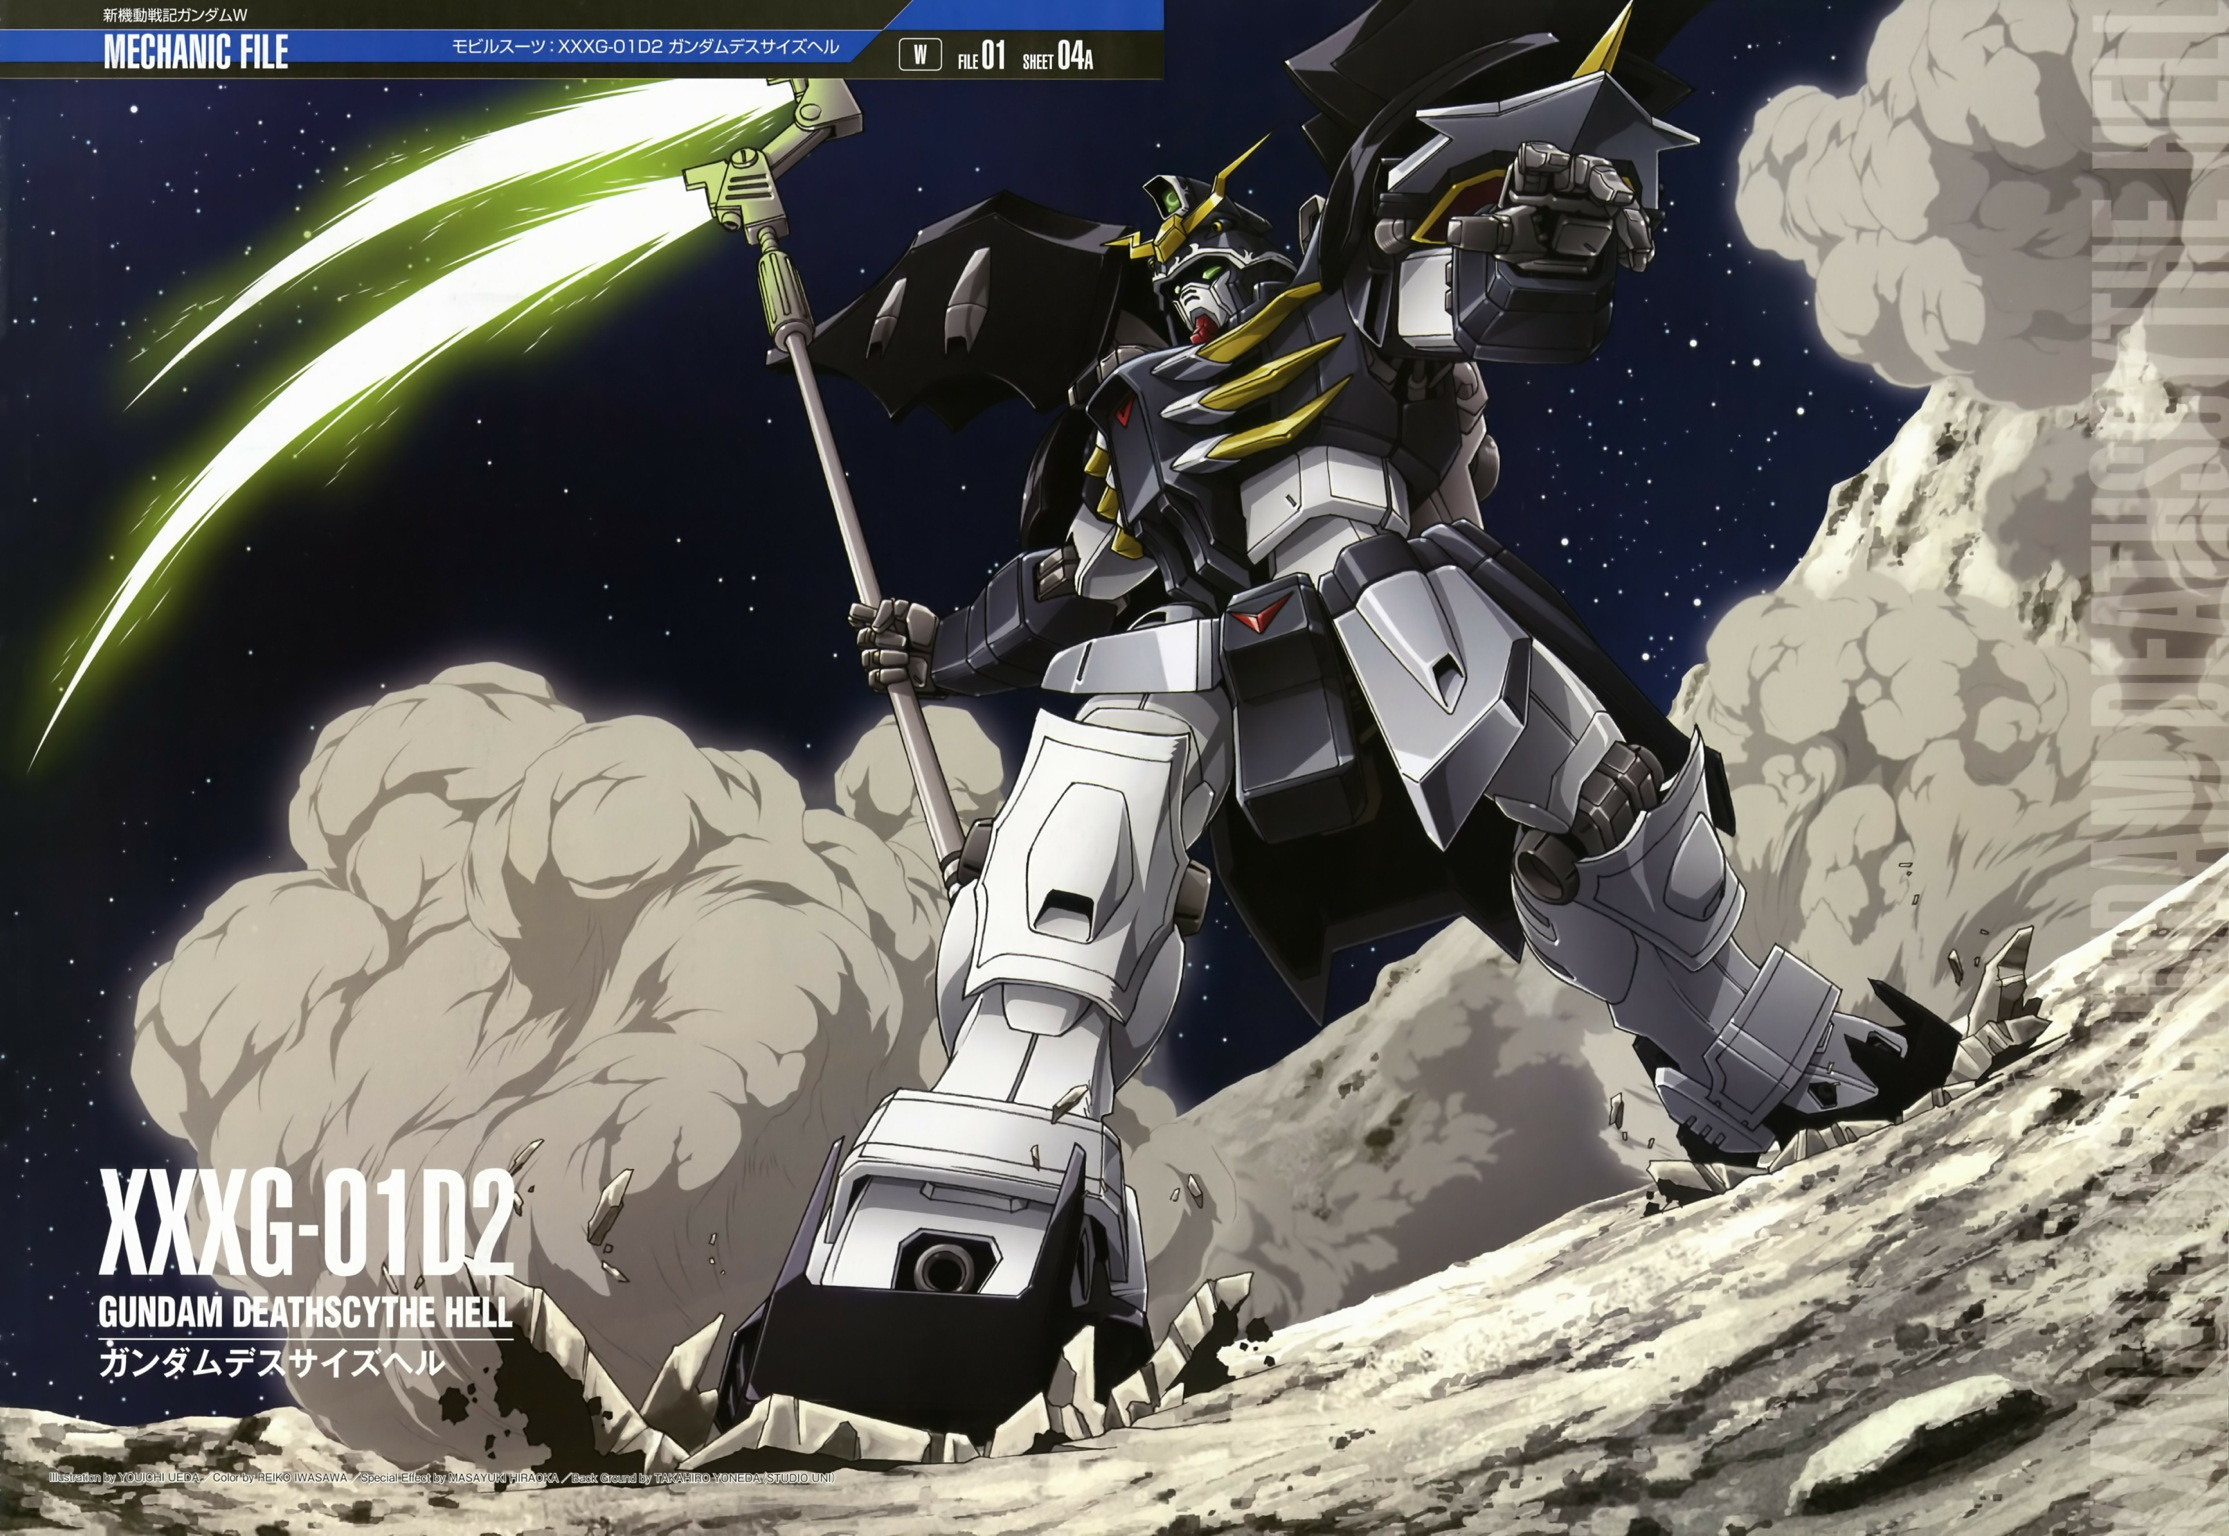 Gundam Deathscythe sketch | Gundam Wing – The Gundams | Pinterest |  Sketches and Gundam